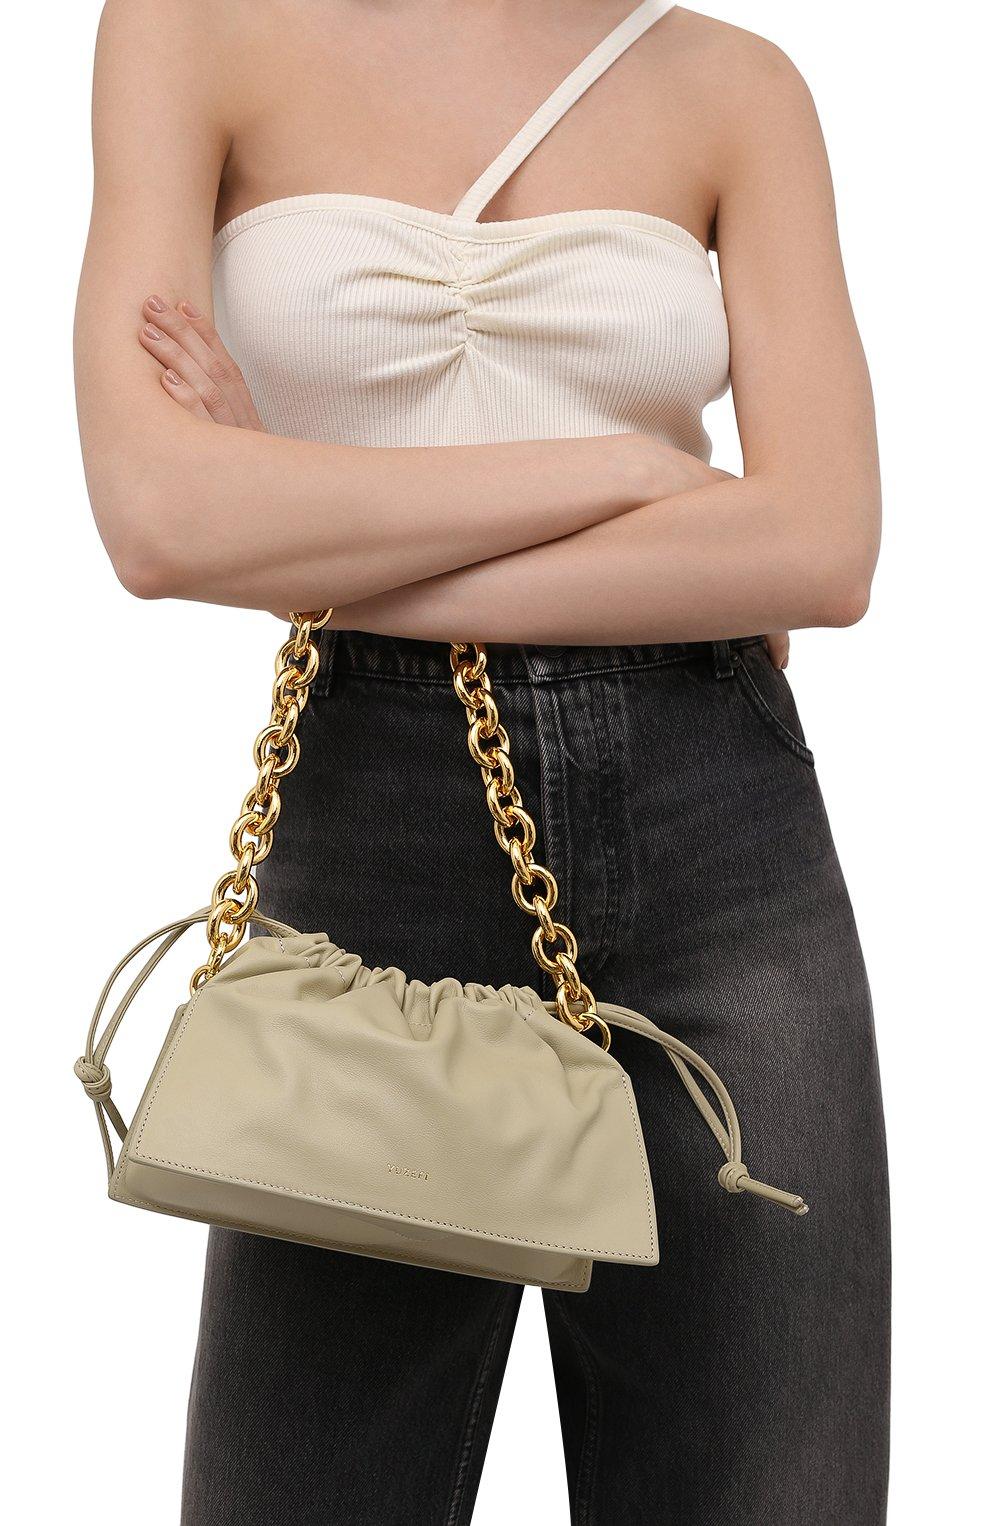 Женская сумка bom YUZEFI светло-зеленого цвета, арт. YUZIC0-HB-B0-13 | Фото 2 (Сумки-технические: Сумки top-handle; Материал: Натуральная кожа; Ремень/цепочка: На ремешке; Размер: small)